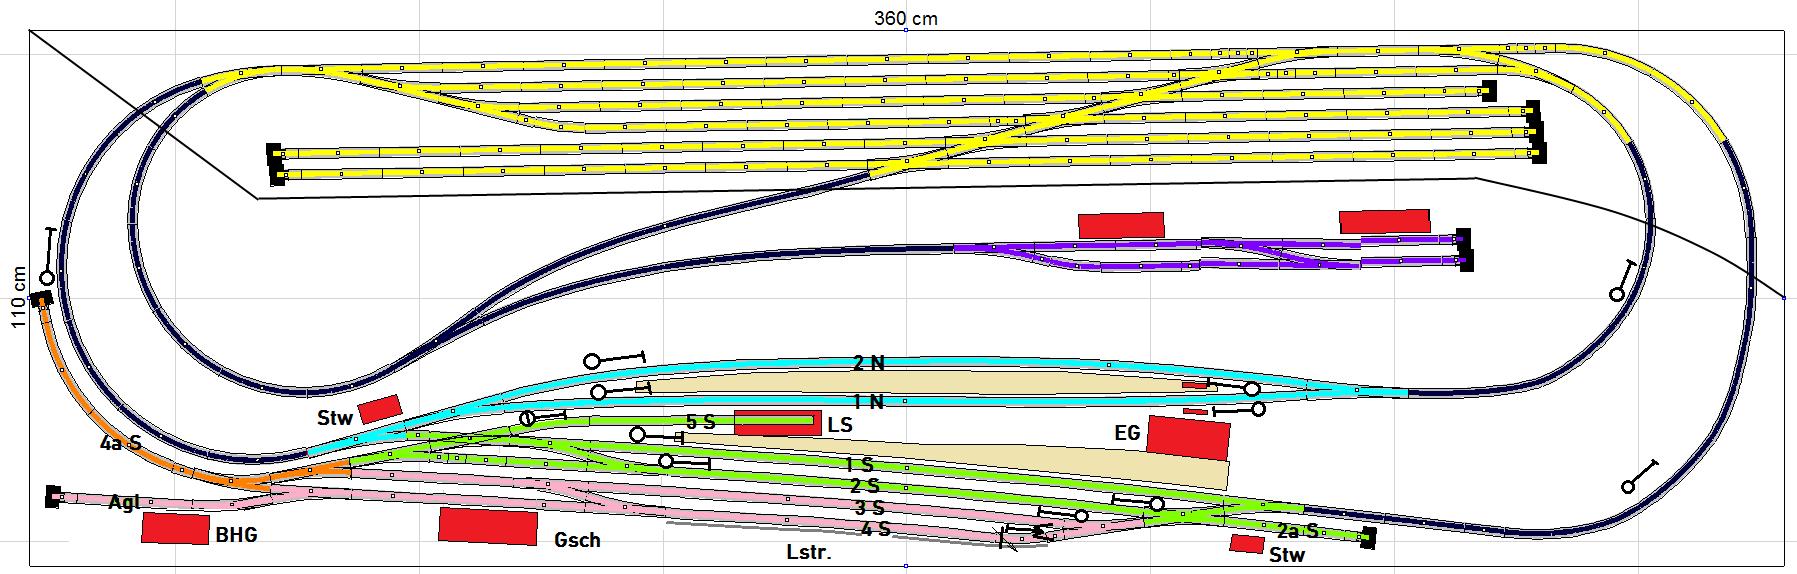 http://www.moba-trickkiste.de/components/com_agora/img/members/138/zeichnung109a.png